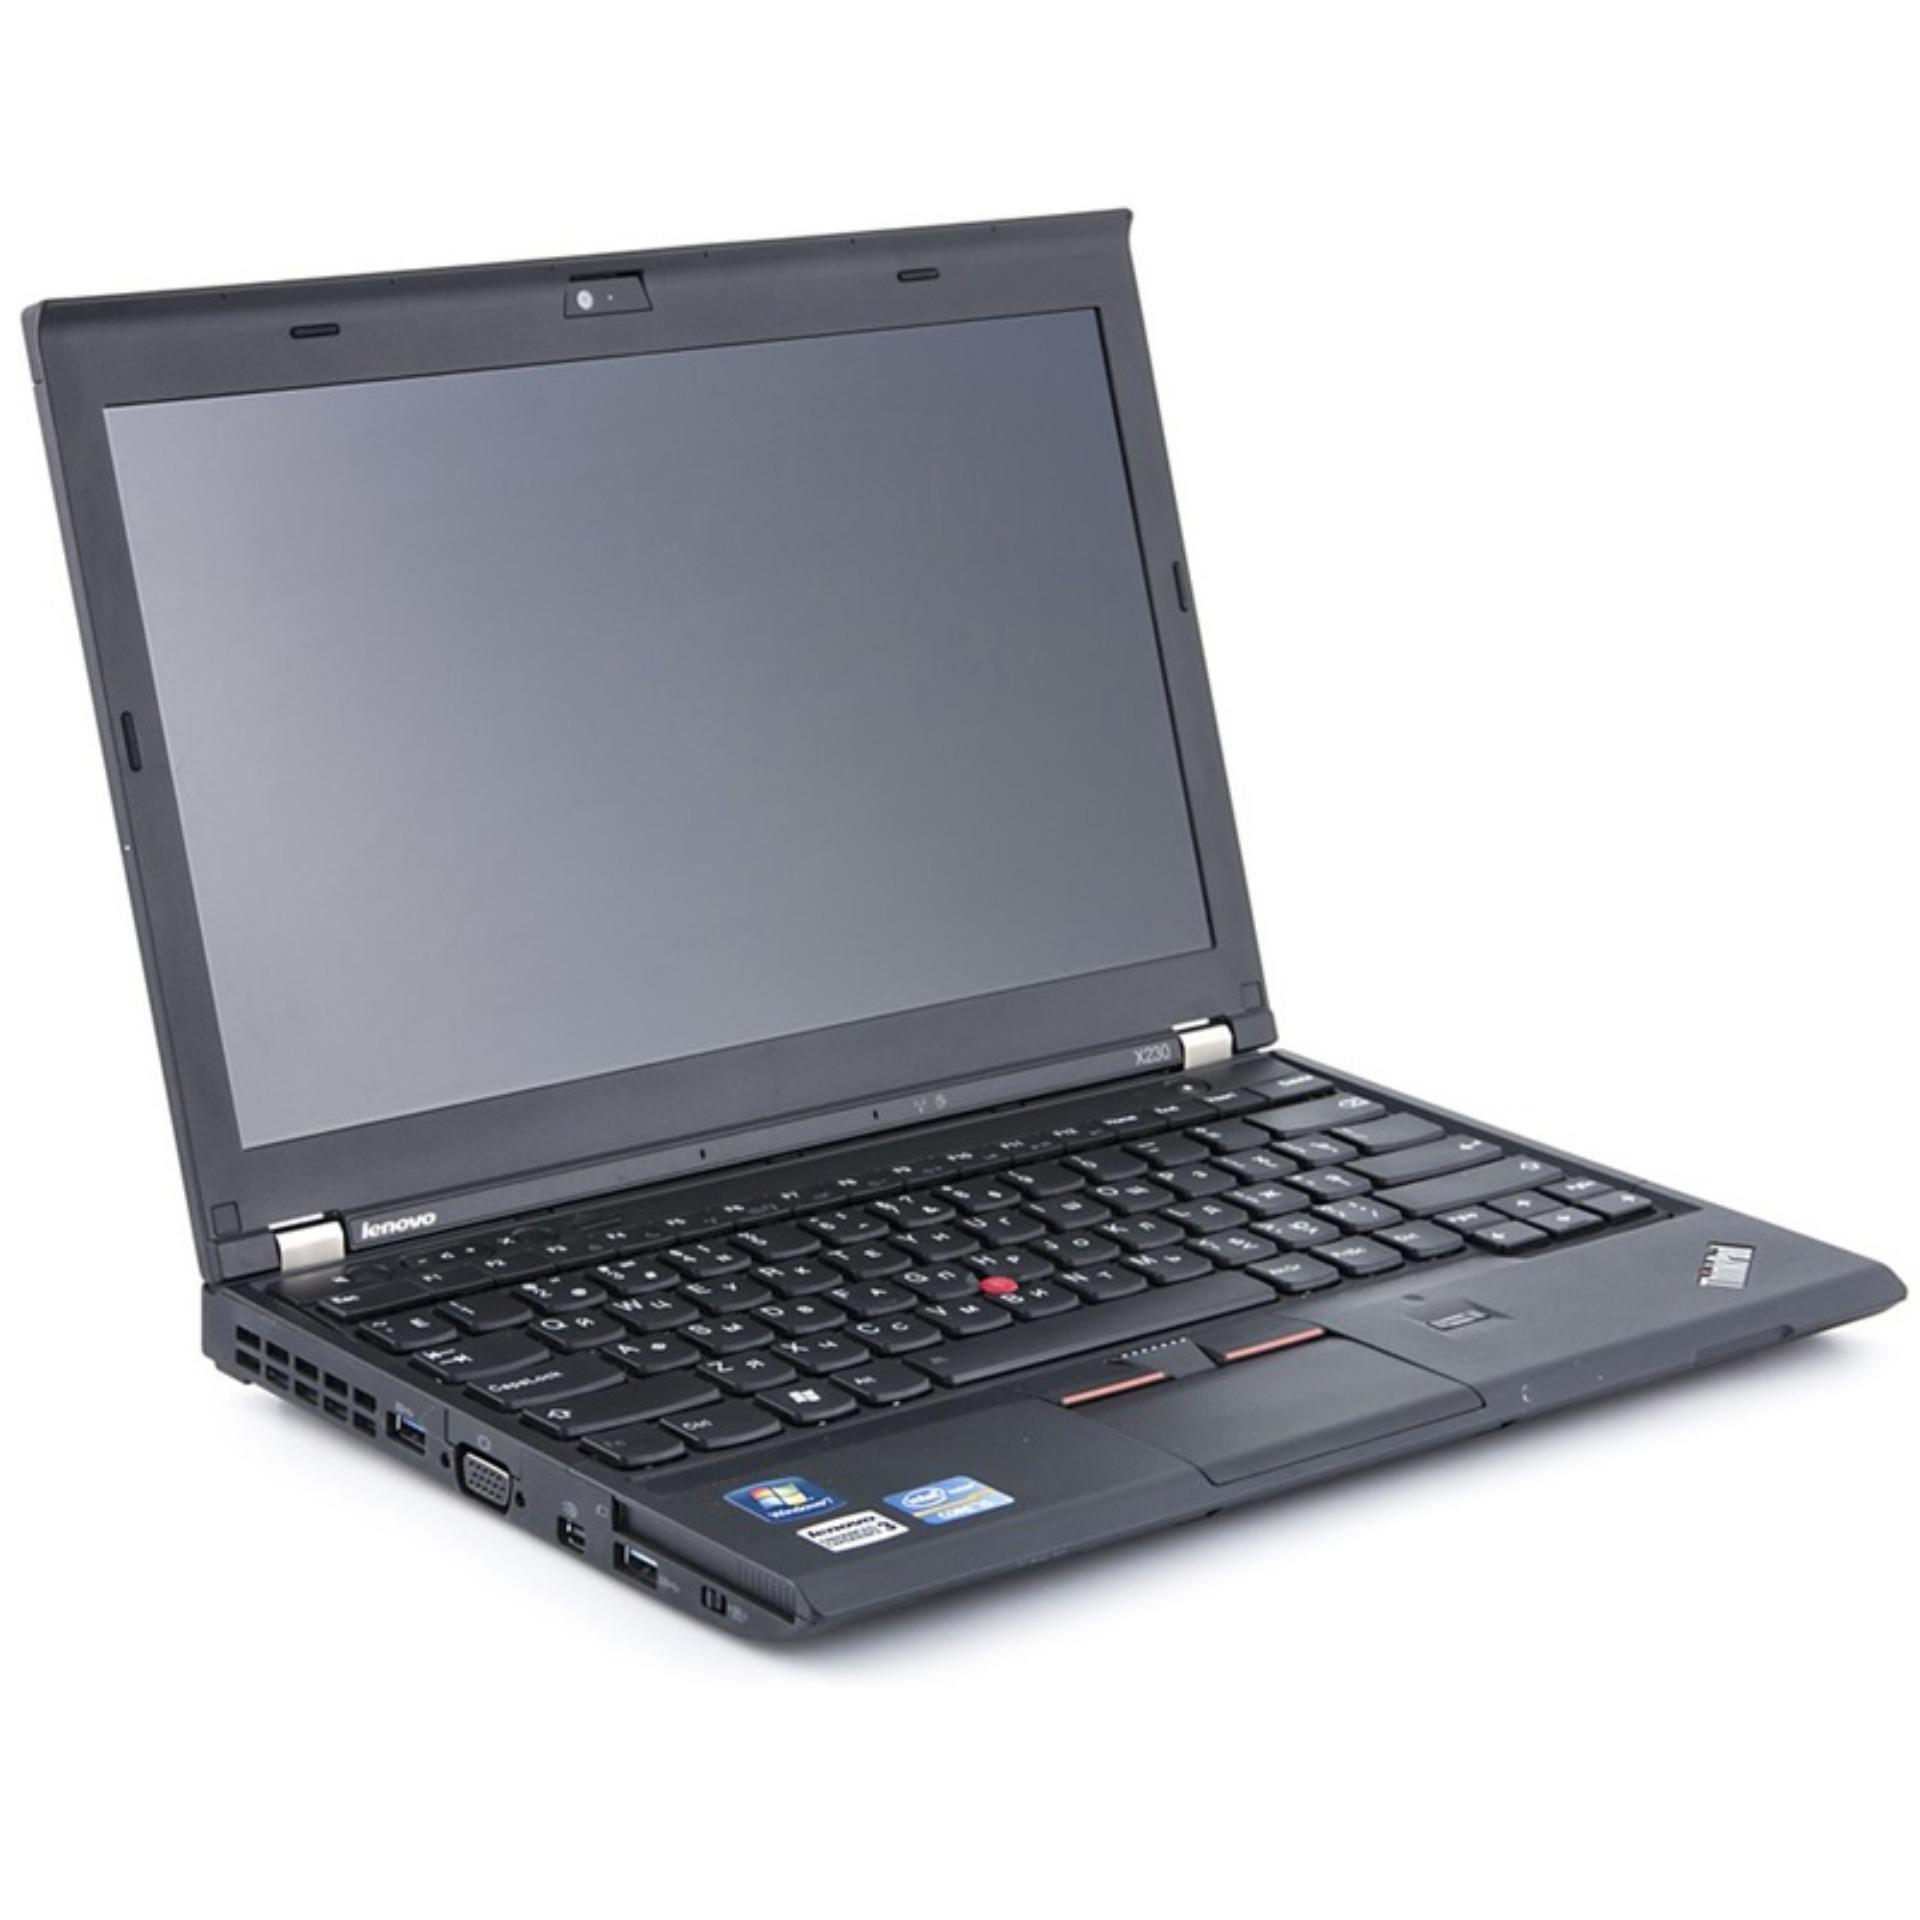 (Refurbished) Lenovo X230 12.5″ (3rd Gen) Core i5 8GB 320GB Windows 7 Pro 64 bit